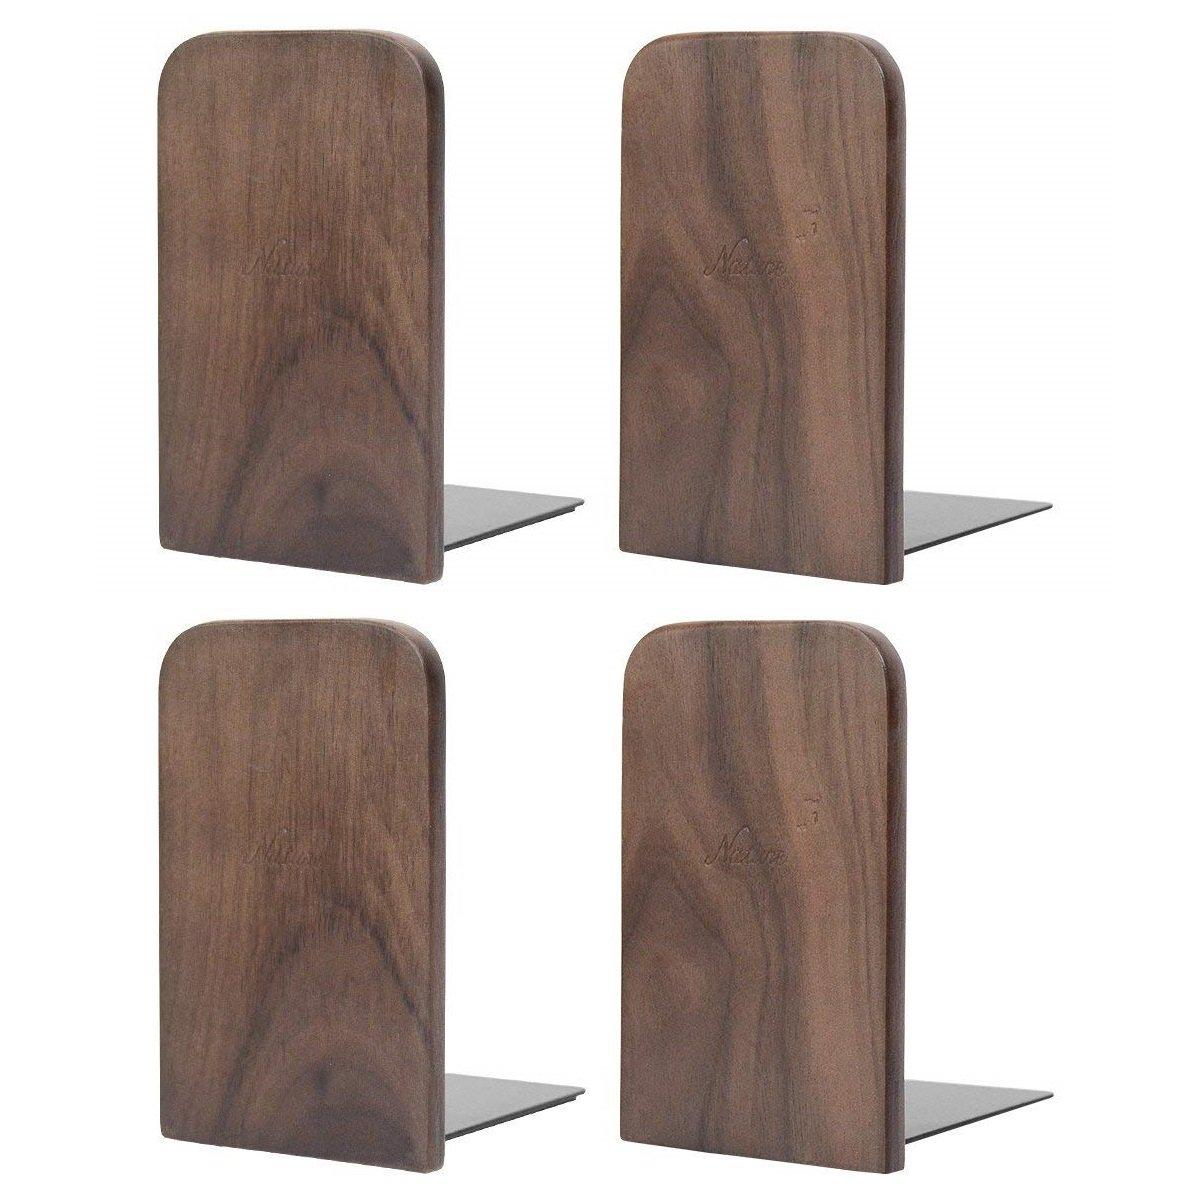 Musowood Bookend Natural Walnut Wood Office Desktop Bookends, (Walnut-2Pairs)